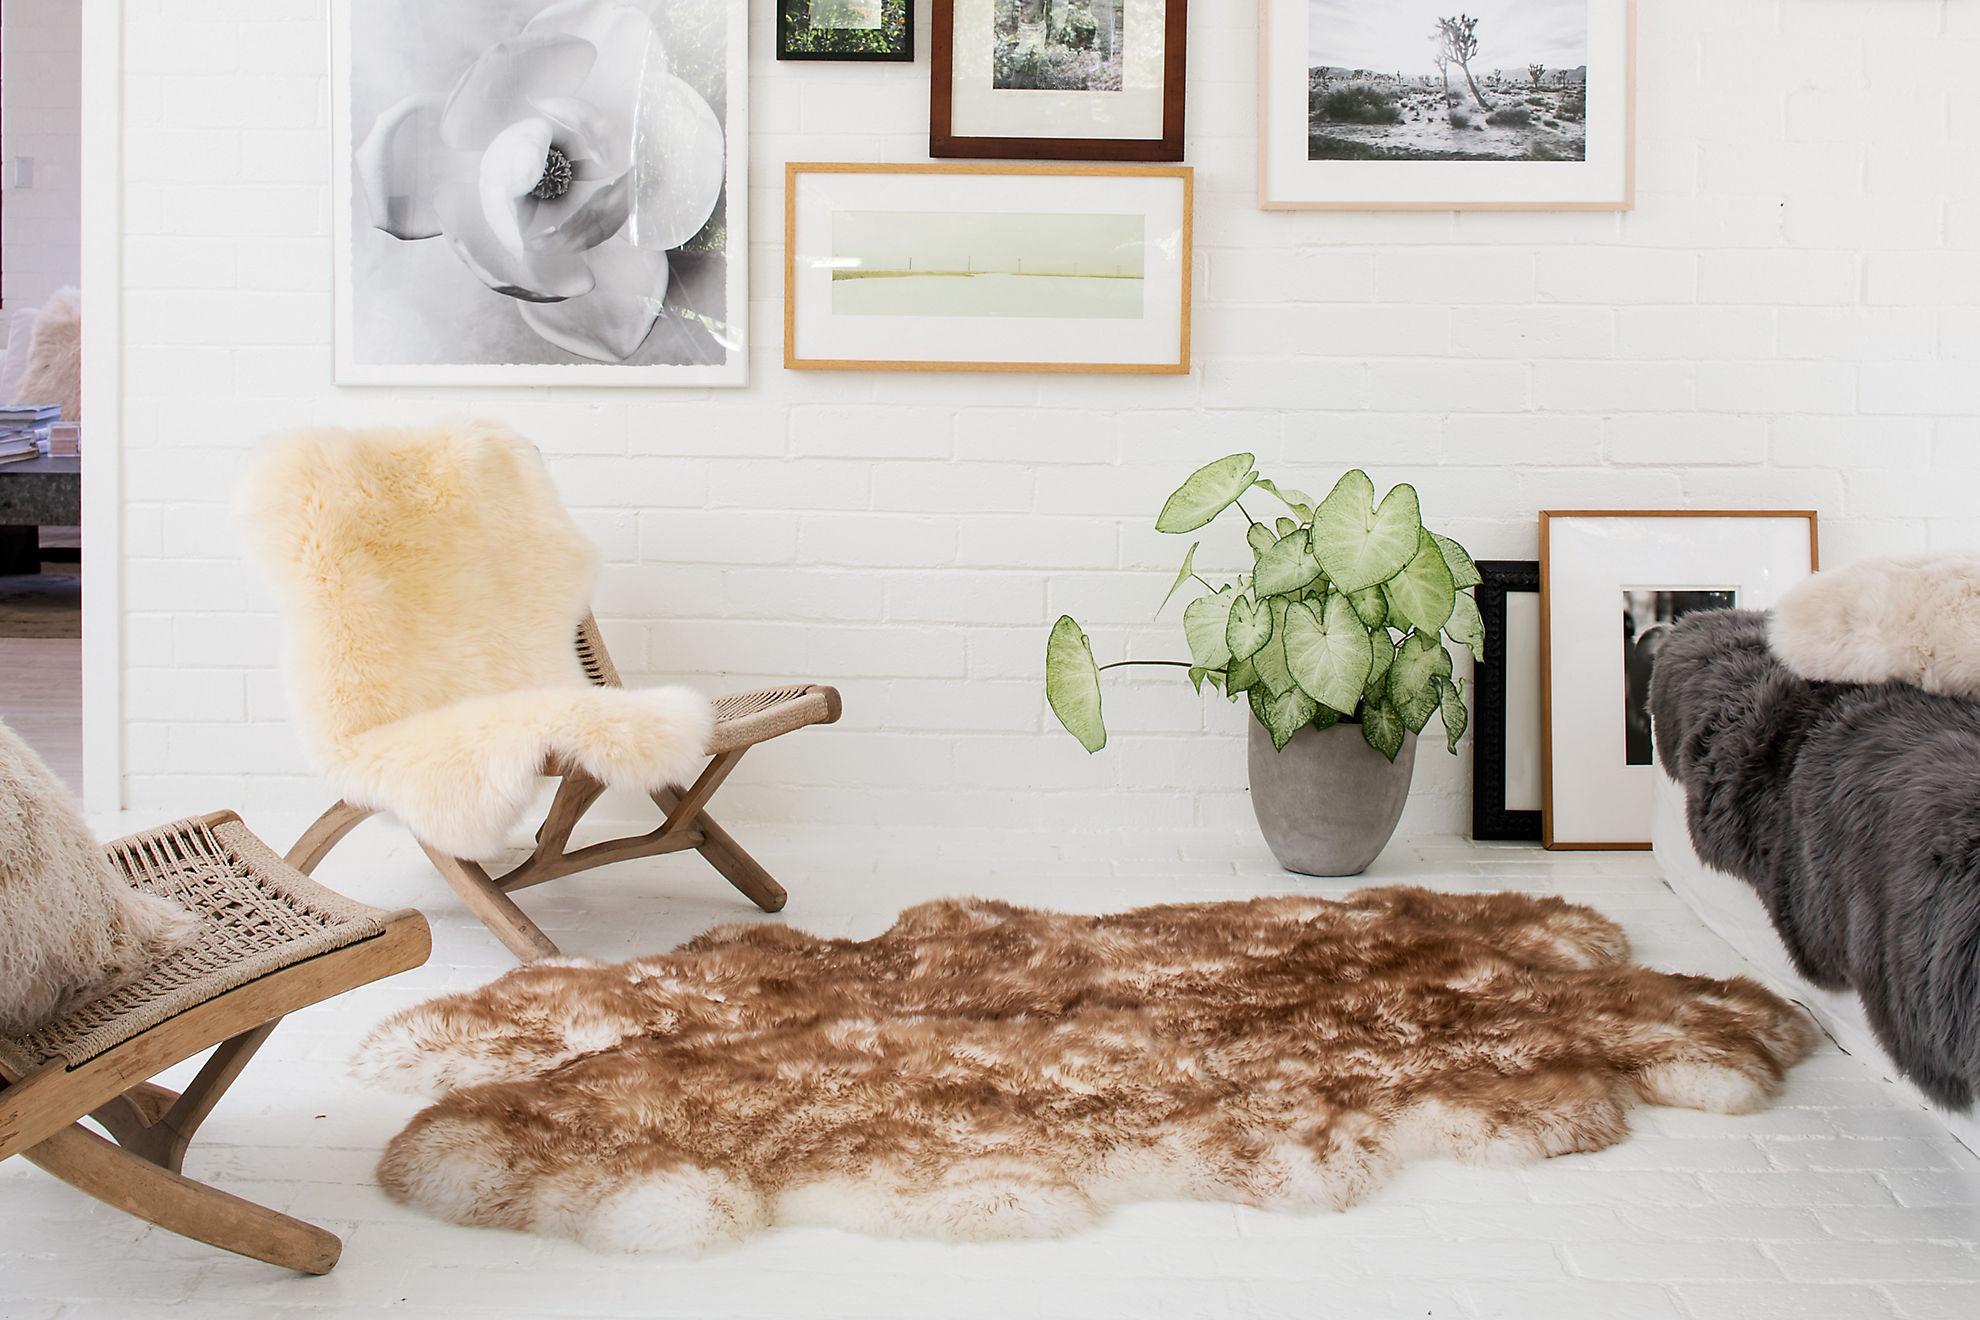 4-Pelt (4' x 6') Premium Australian Sheepskin Rug